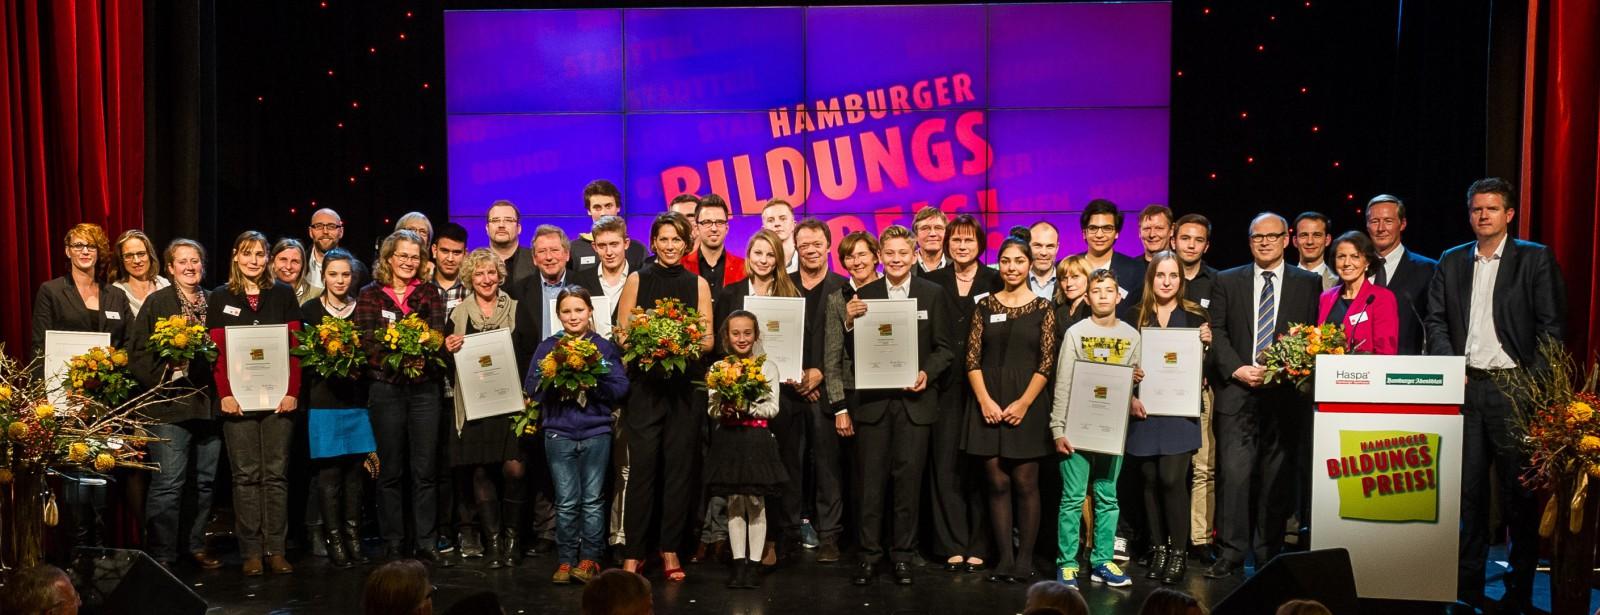 Hamburger Bildungspreis Nov 2014 alle Preisträger